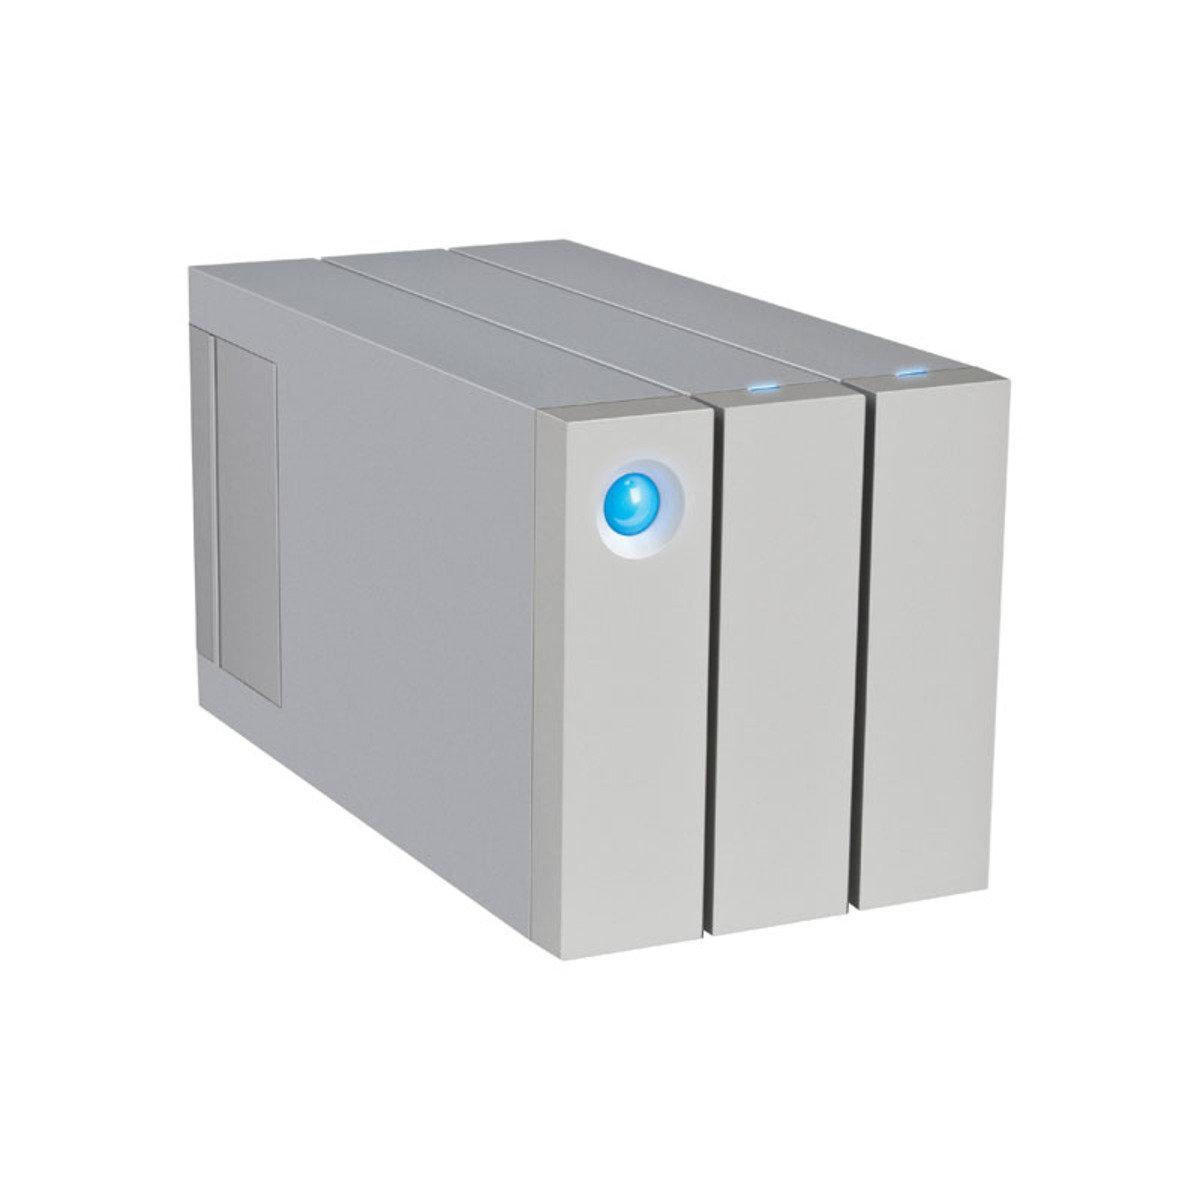 2big Thunderbolt 2 12TB 3.5吋 雙硬碟RAID外置硬碟 9000473U